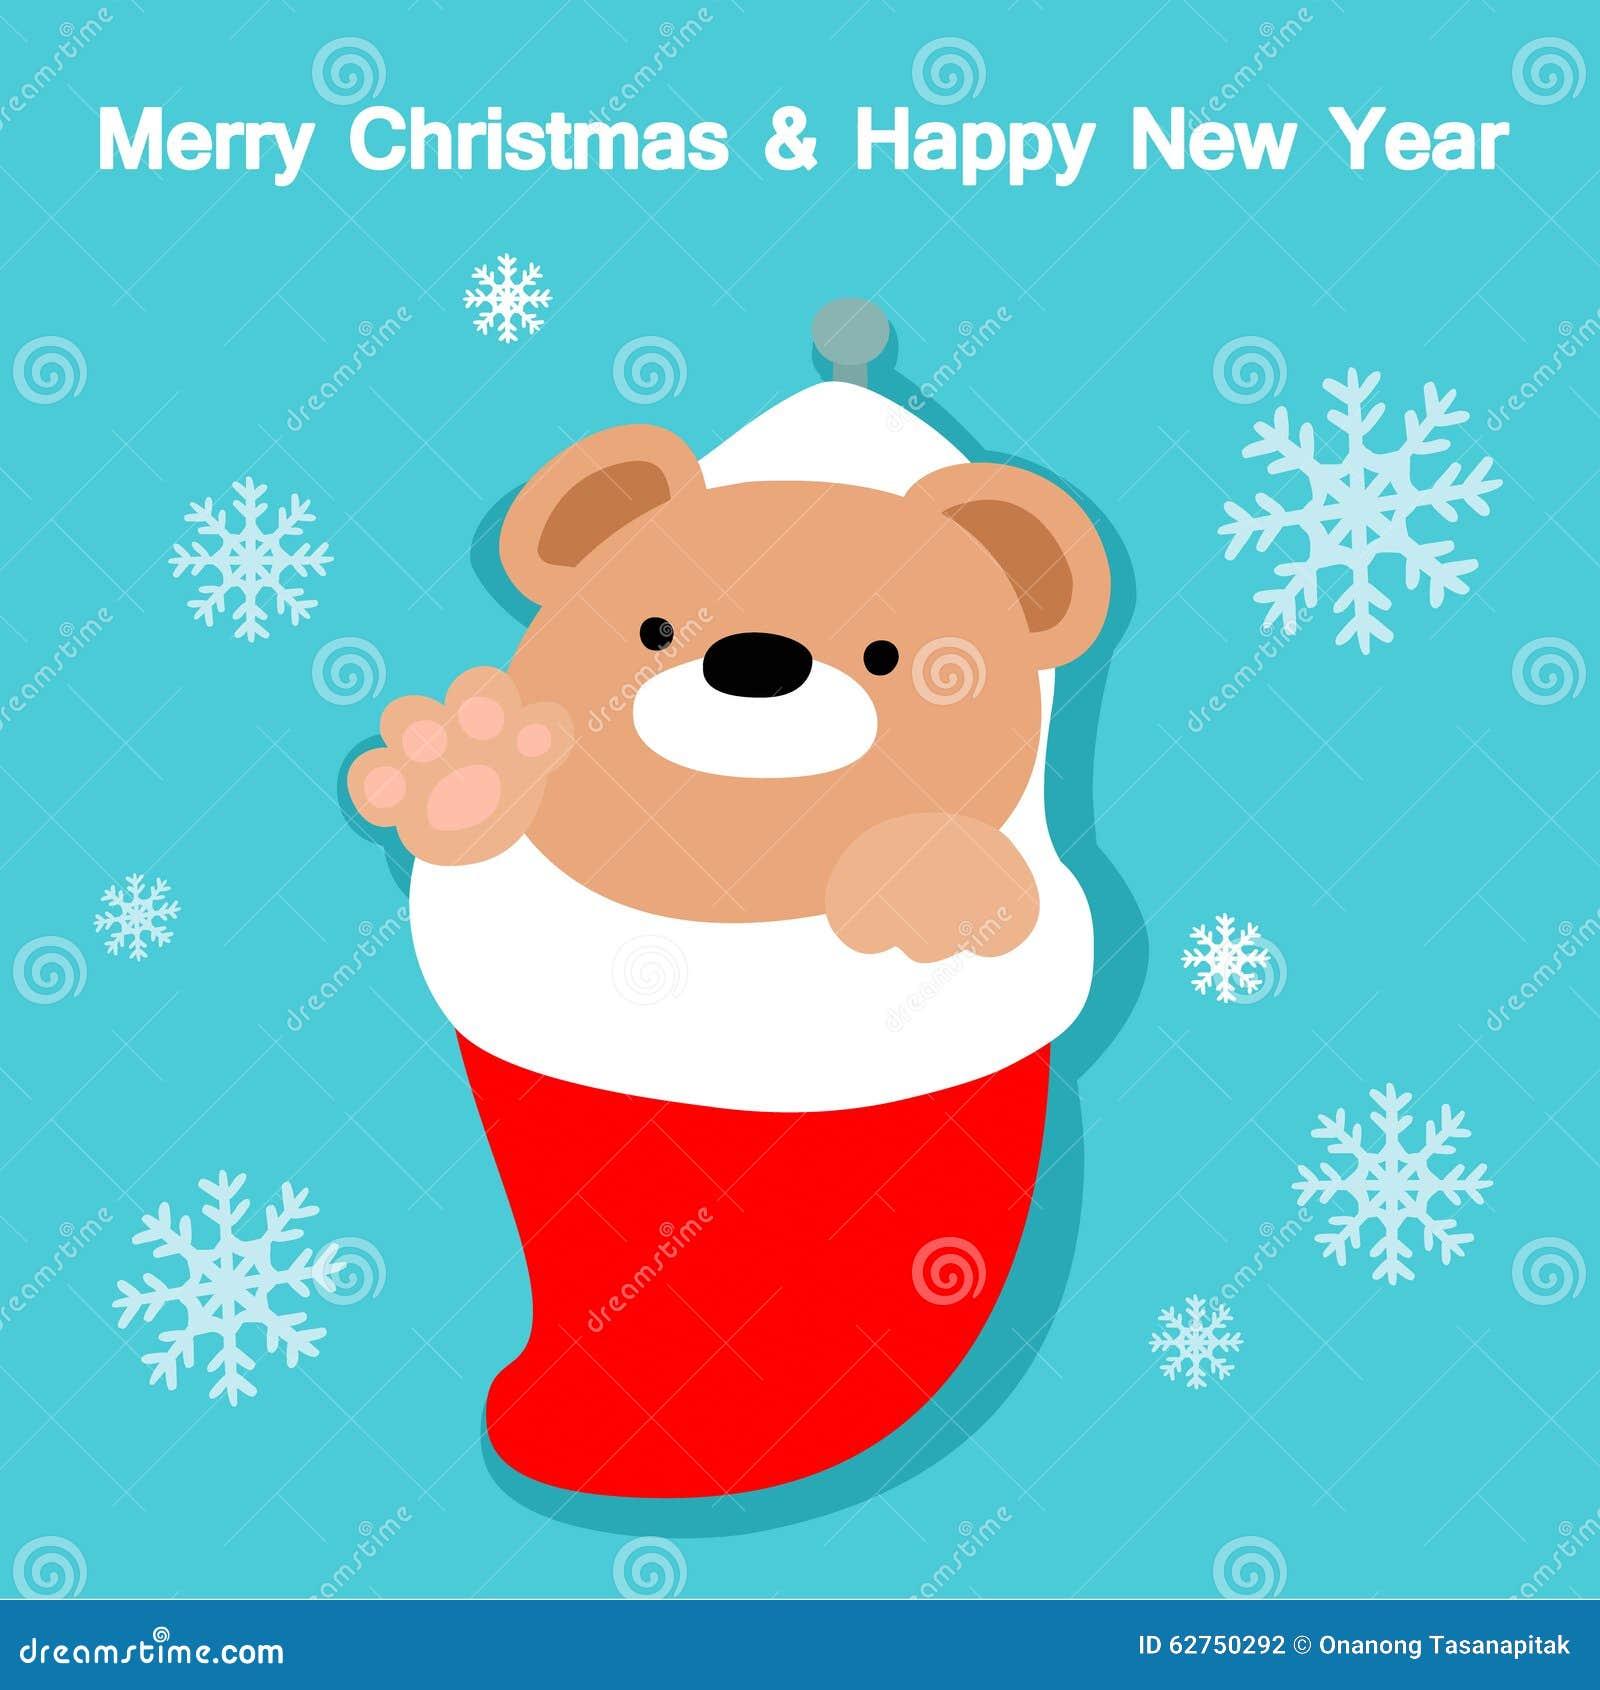 4455401b2e3e Merry Christmas And Happy New Year Cute Bear Card Stock Vector ...